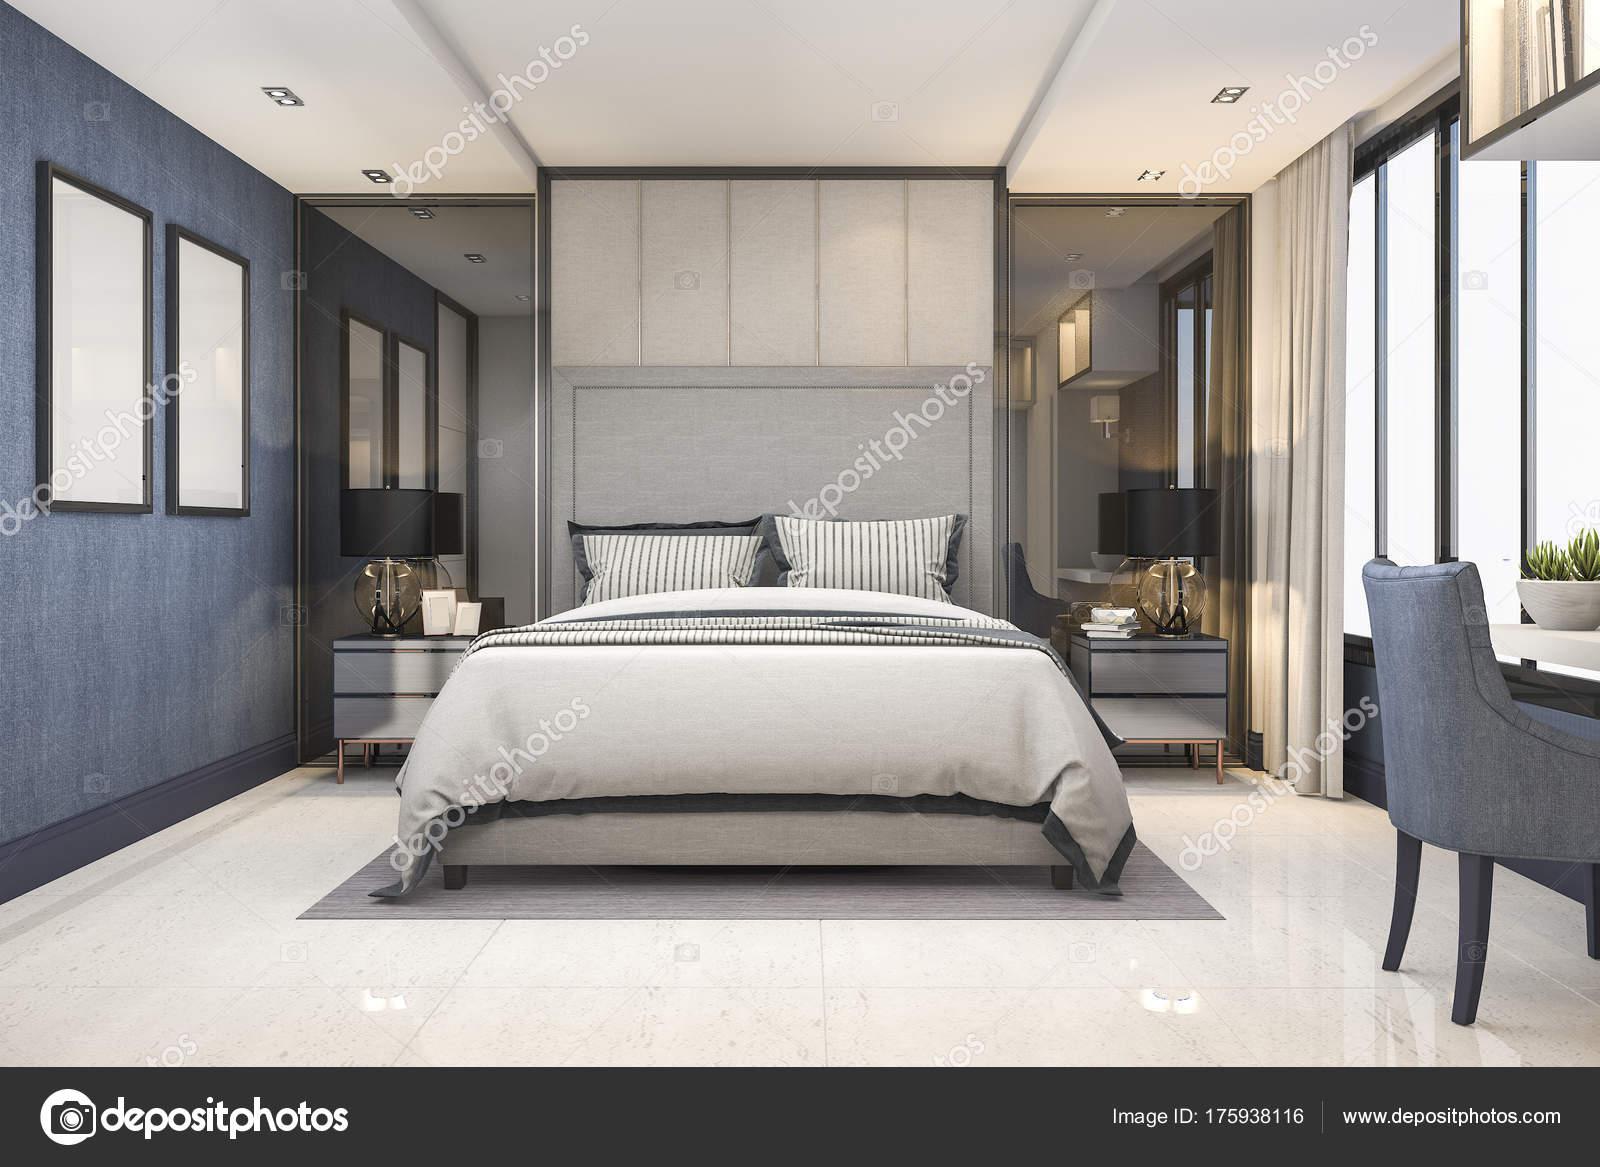 . Rendering Blue Modern Luxury Bedroom Suite Hotel Decor   Stock Photo